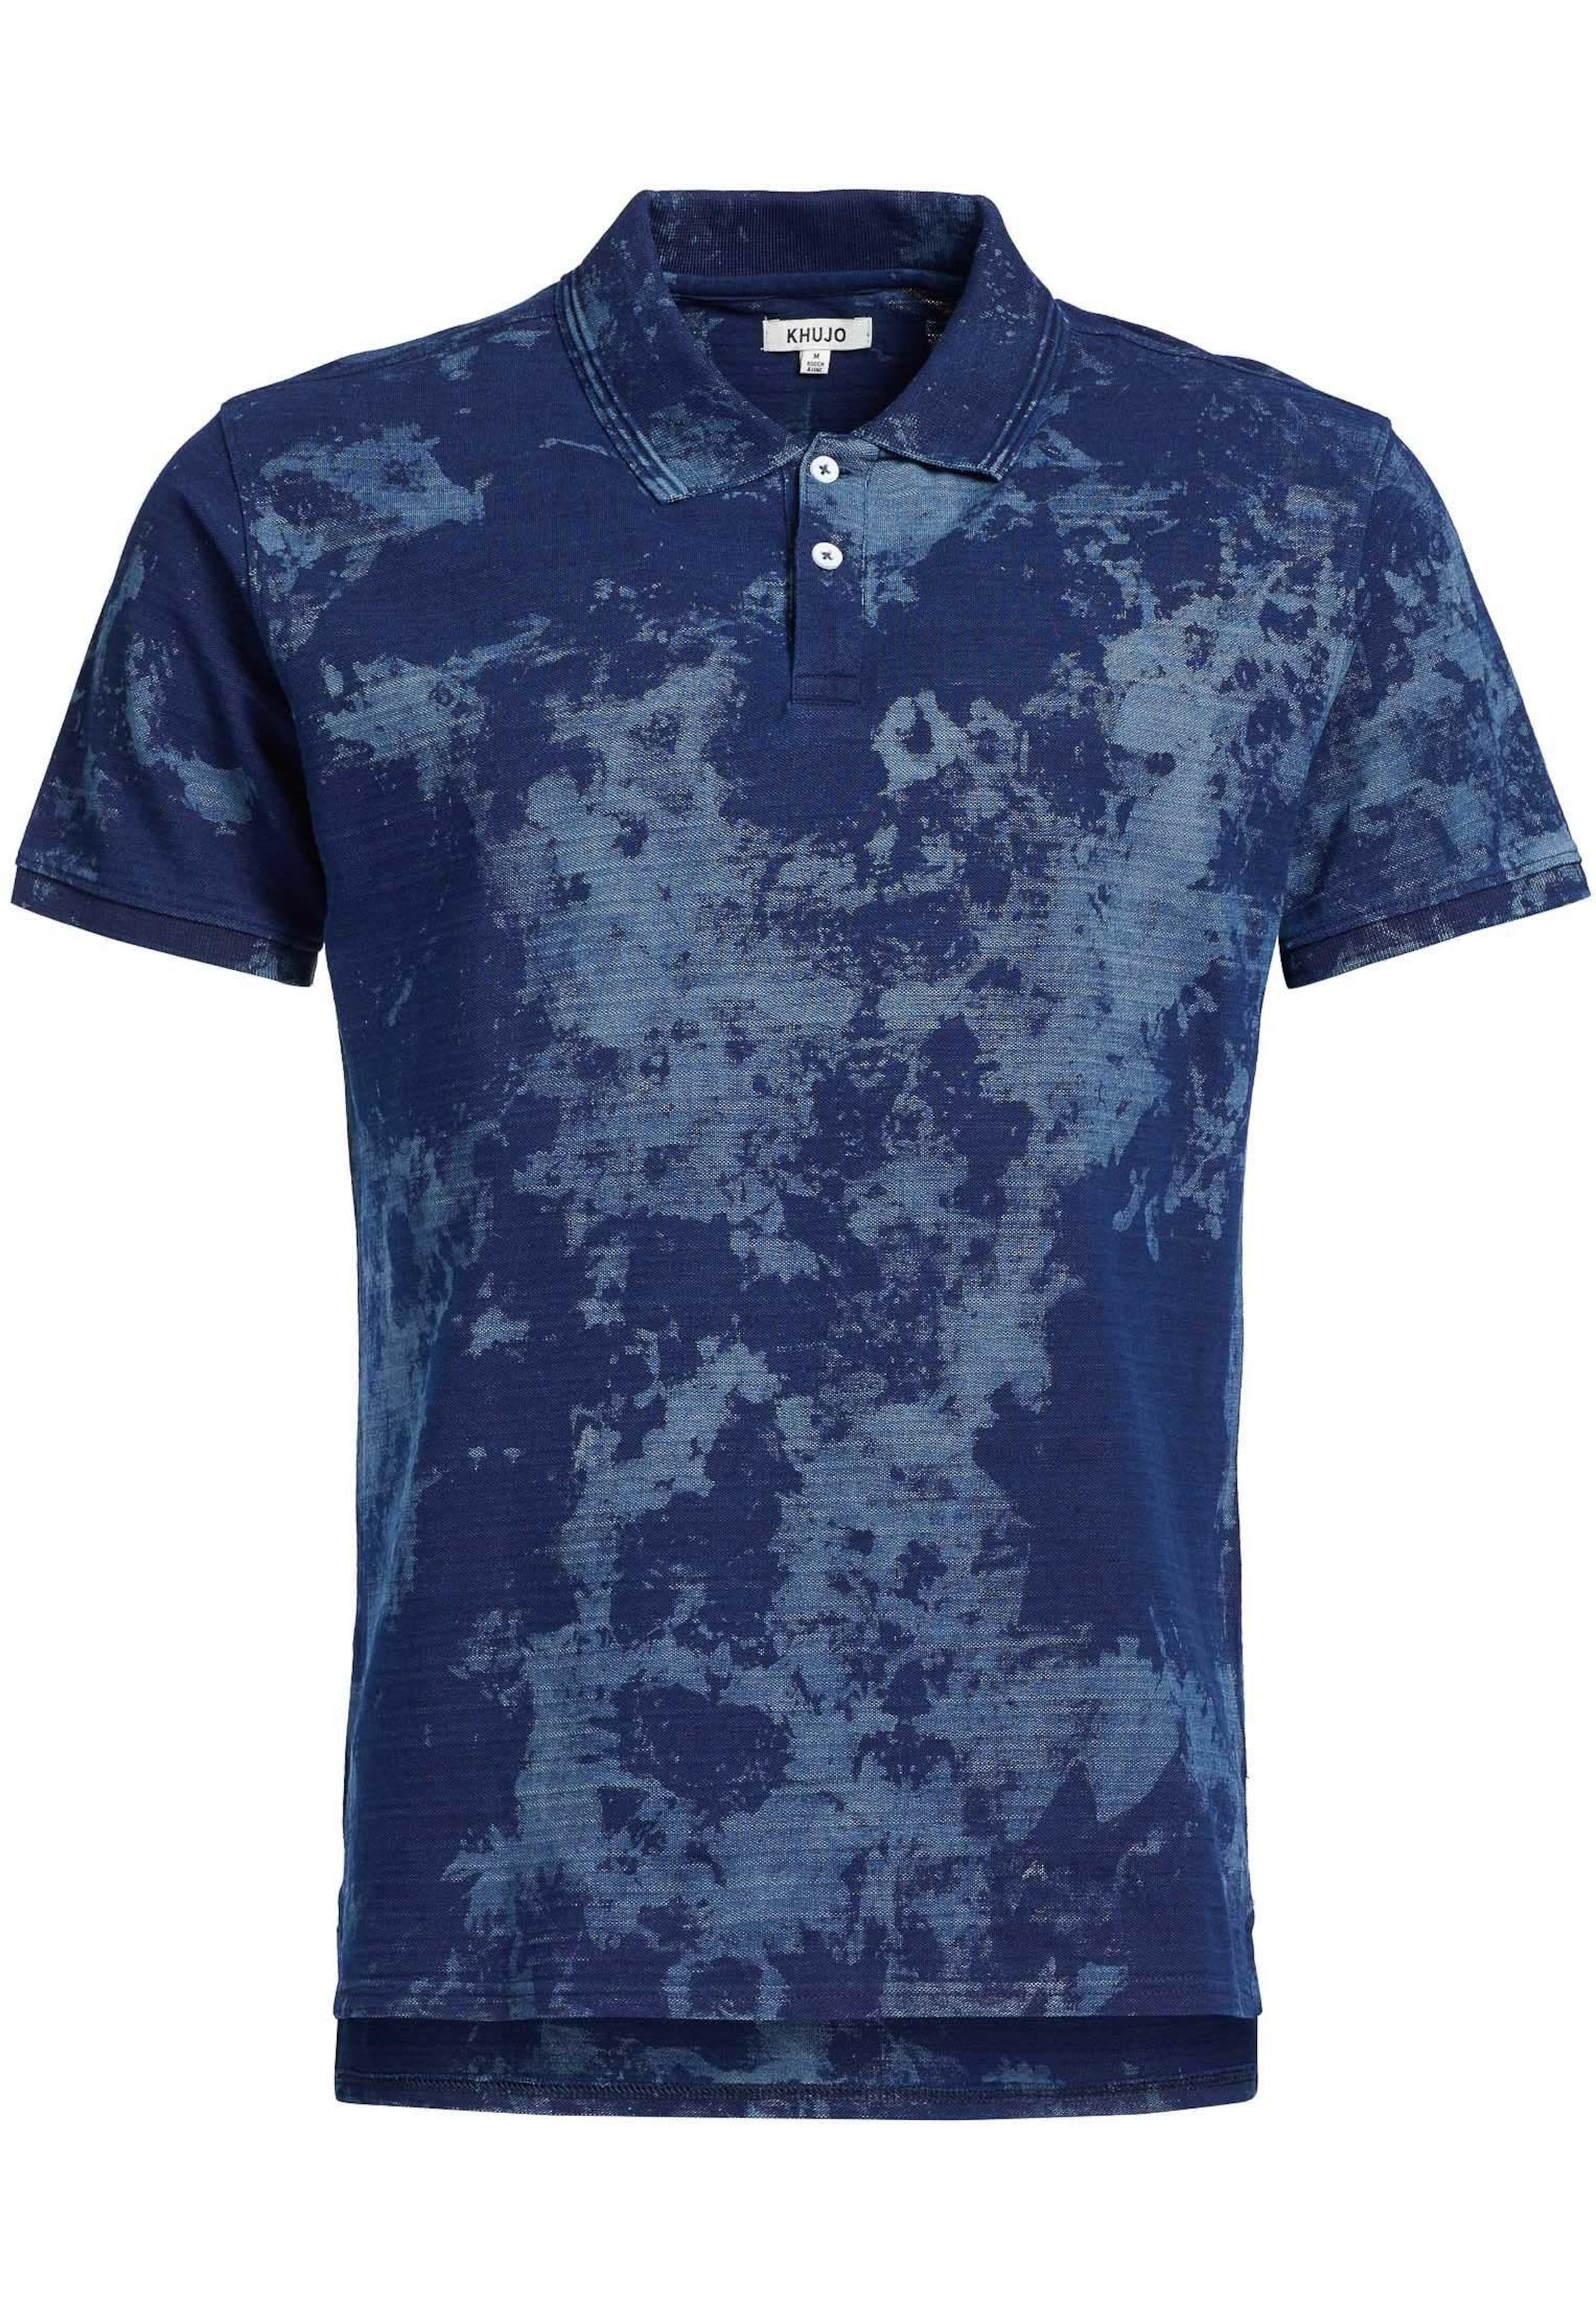 shirt T 'octave' En Khujo RauchblauSaphir Tc3F1lKJ